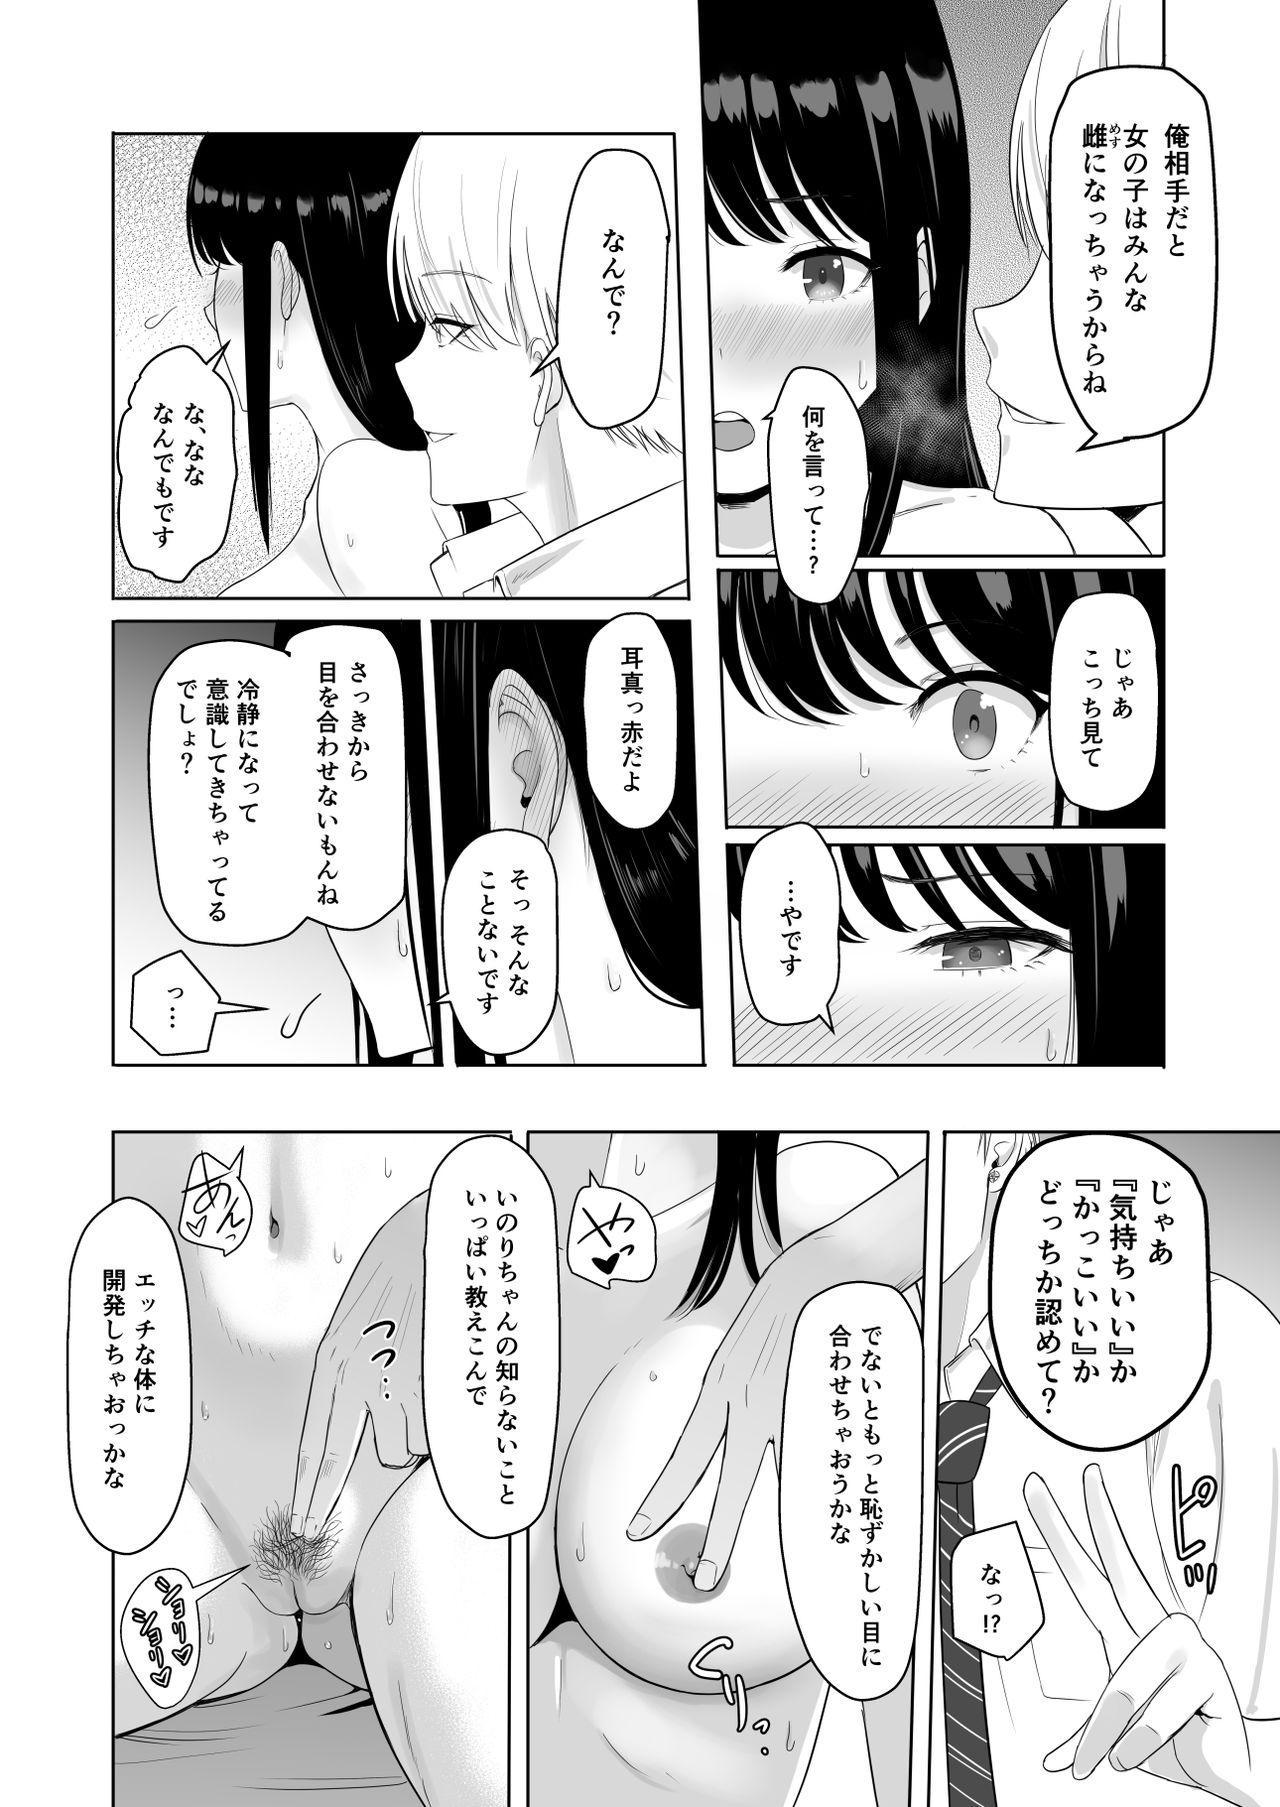 Kimi ga Tame. 2 Ichikawa Inori 72